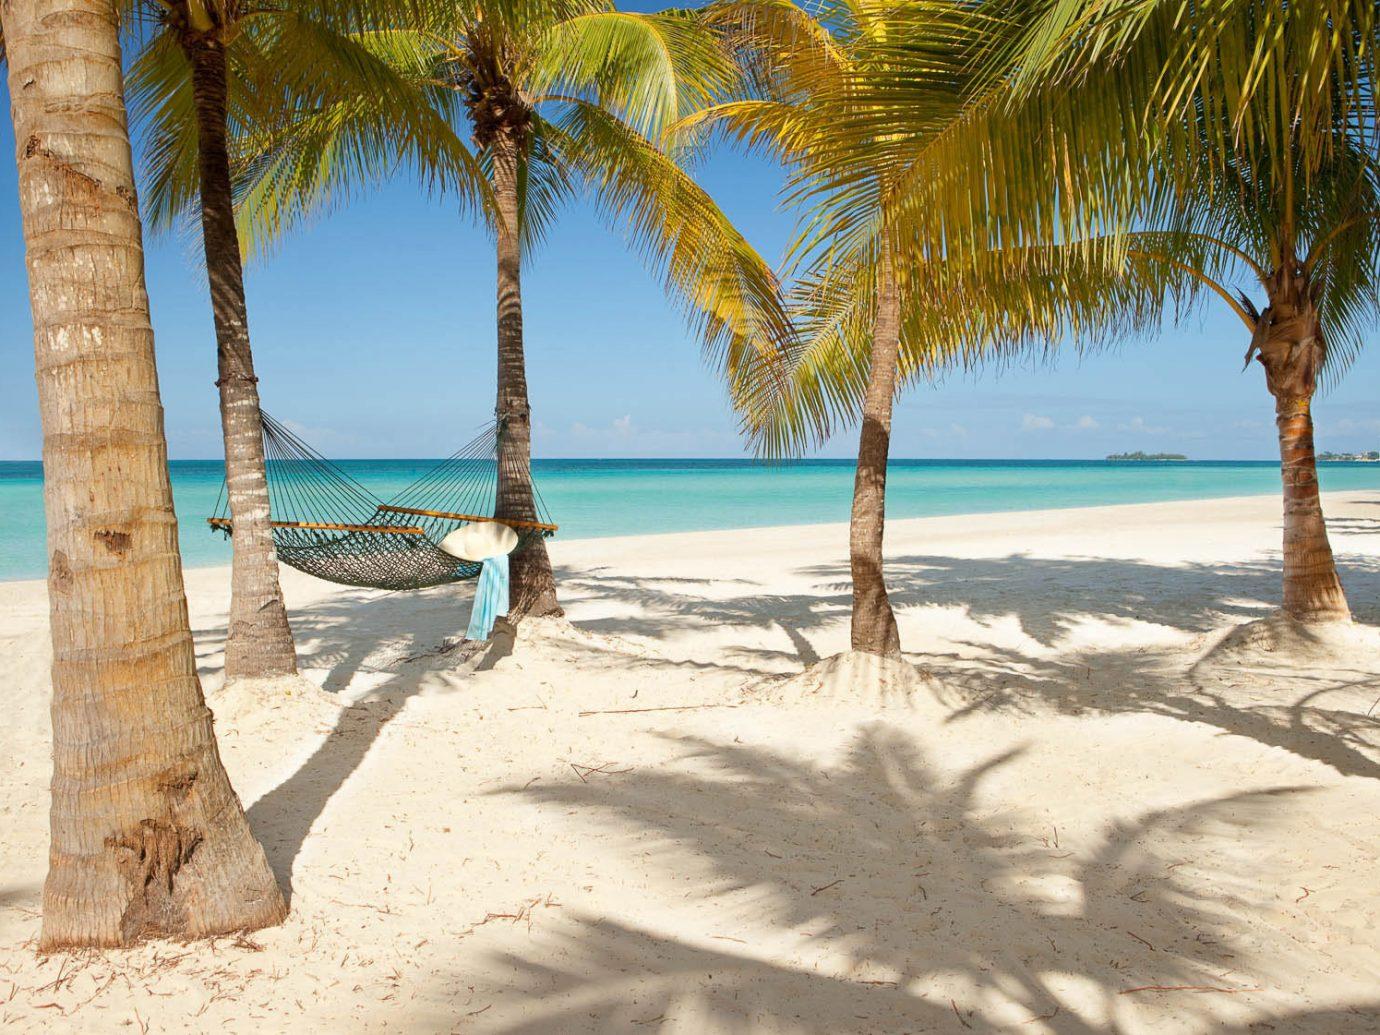 Hotels outdoor Beach water sky tree palm shore body of water Sea Ocean vacation caribbean sandy Nature sand arecales plant Coast tropics bay shade